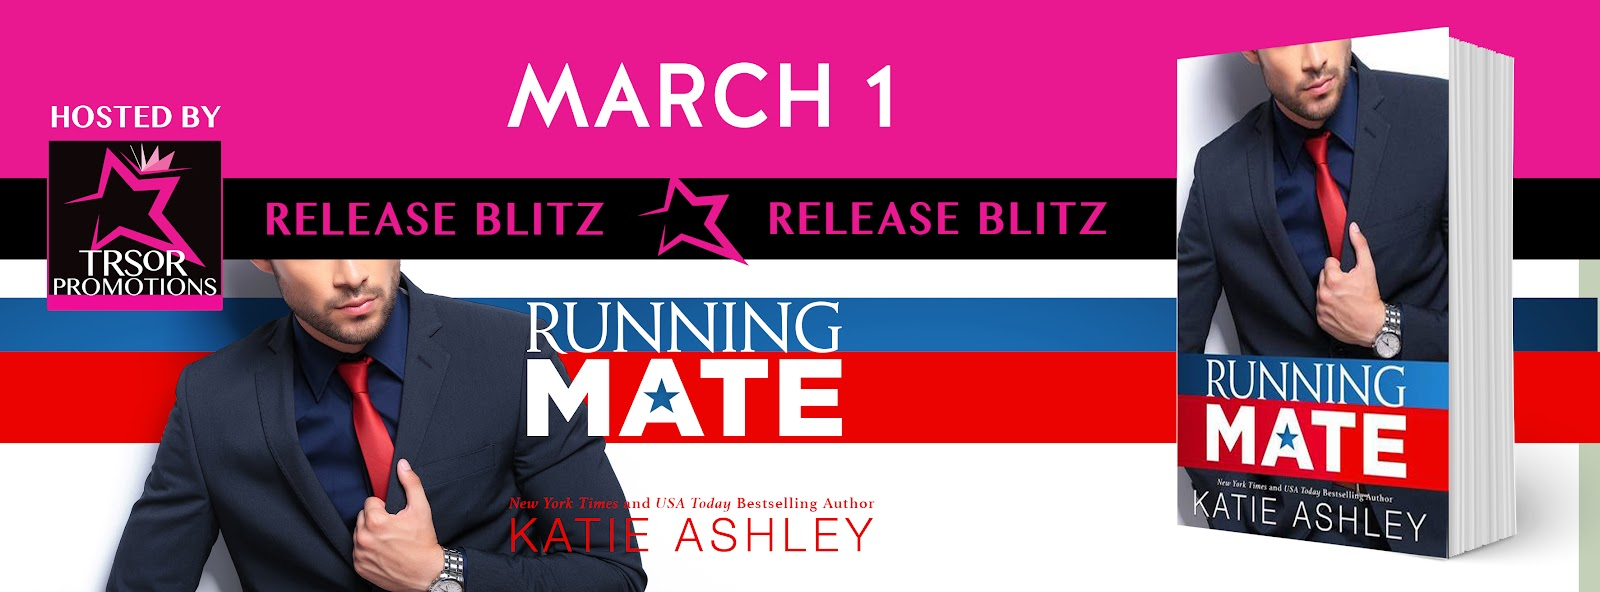 RUNNING_MATE_BLITZ.jpg